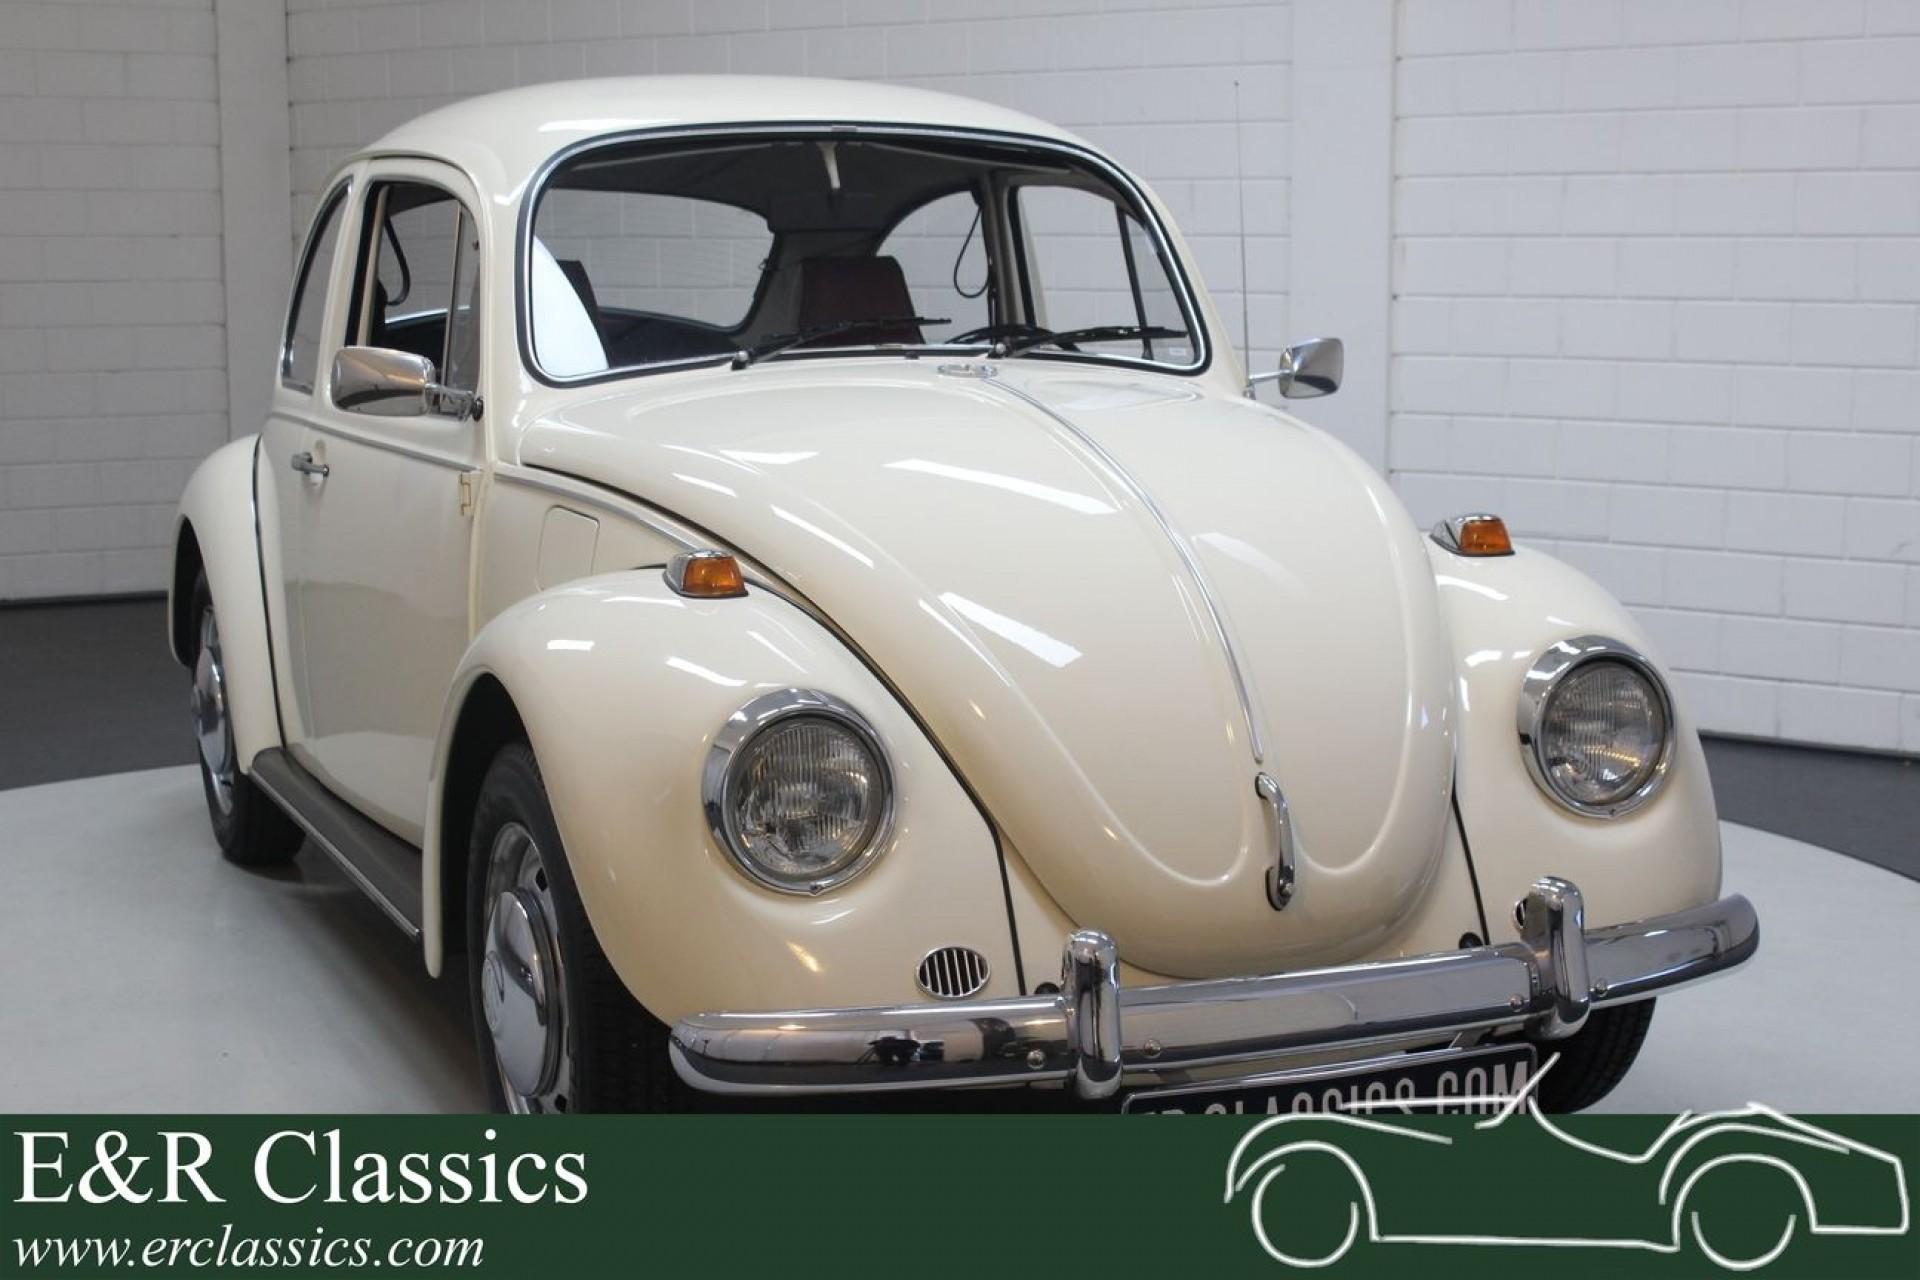 volkswagen beetle 1200 1969 for sale at erclassics  e&r classics